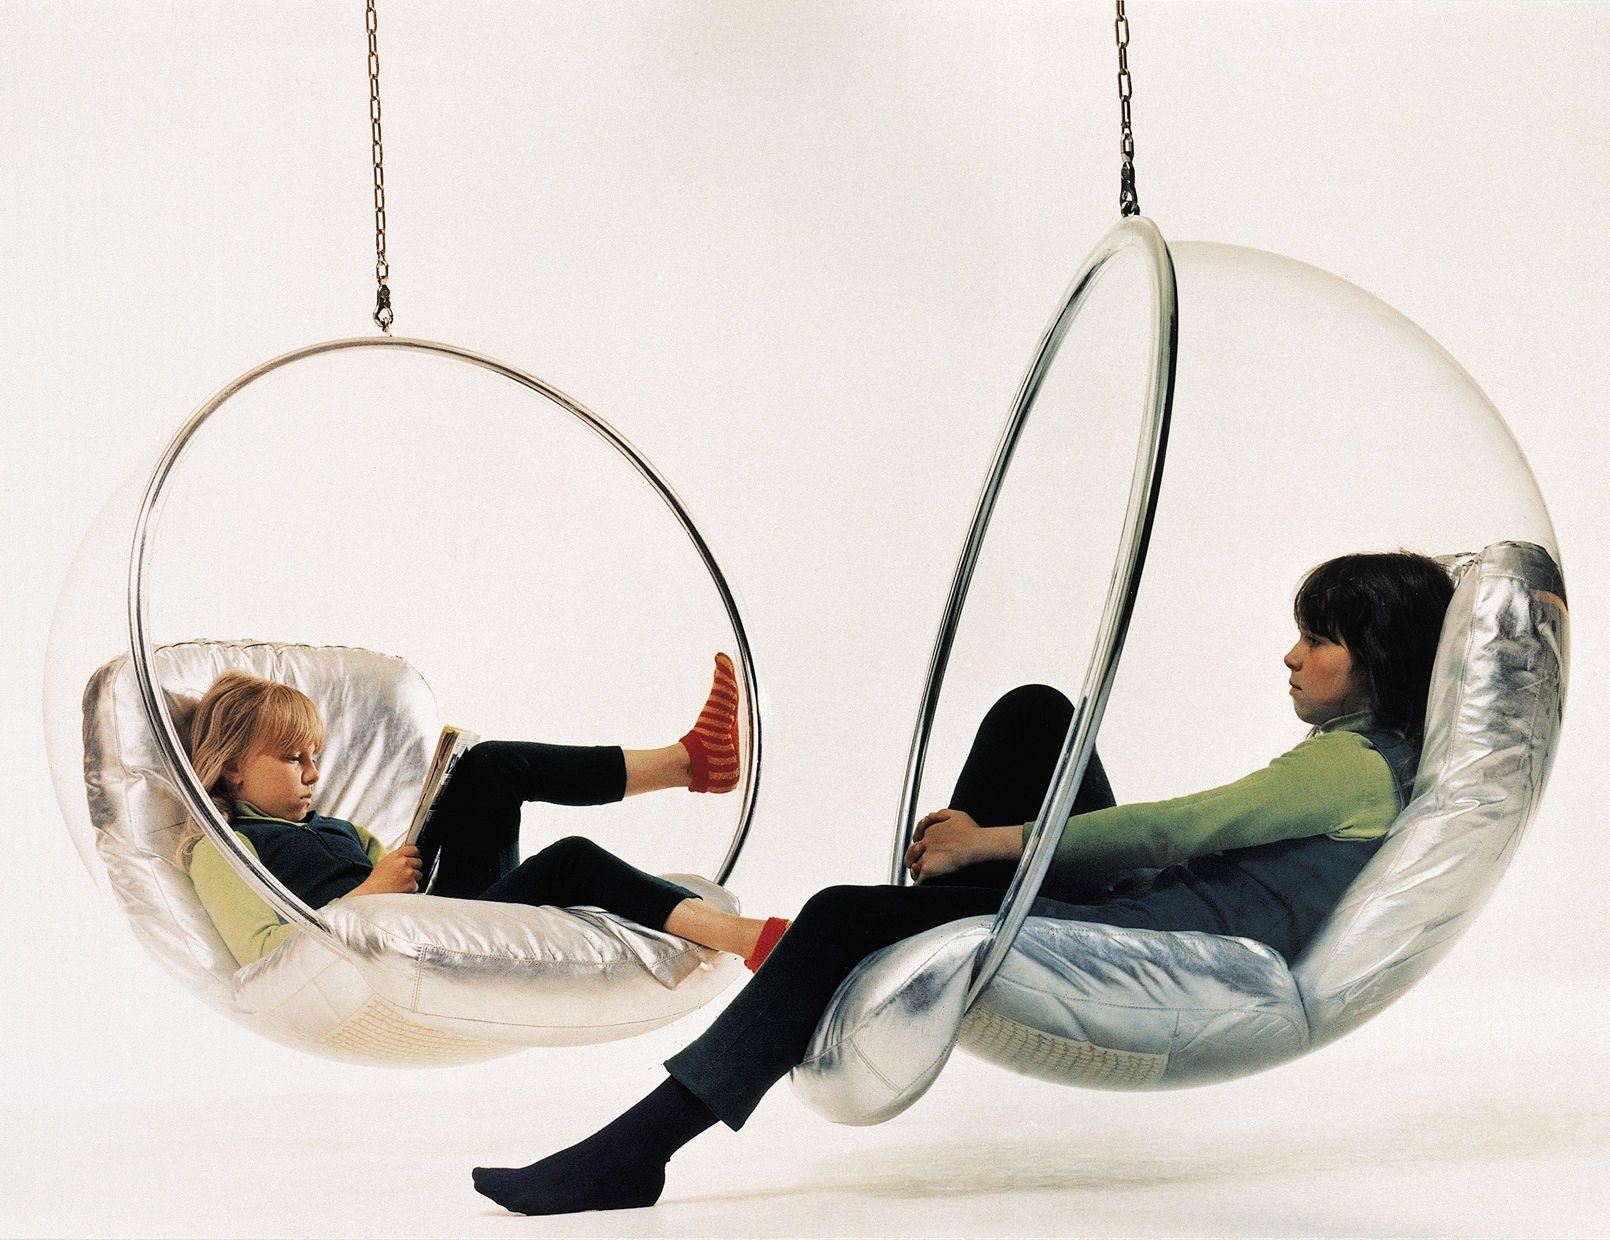 fauteuil bubble chair suspendre confort sillas. Black Bedroom Furniture Sets. Home Design Ideas